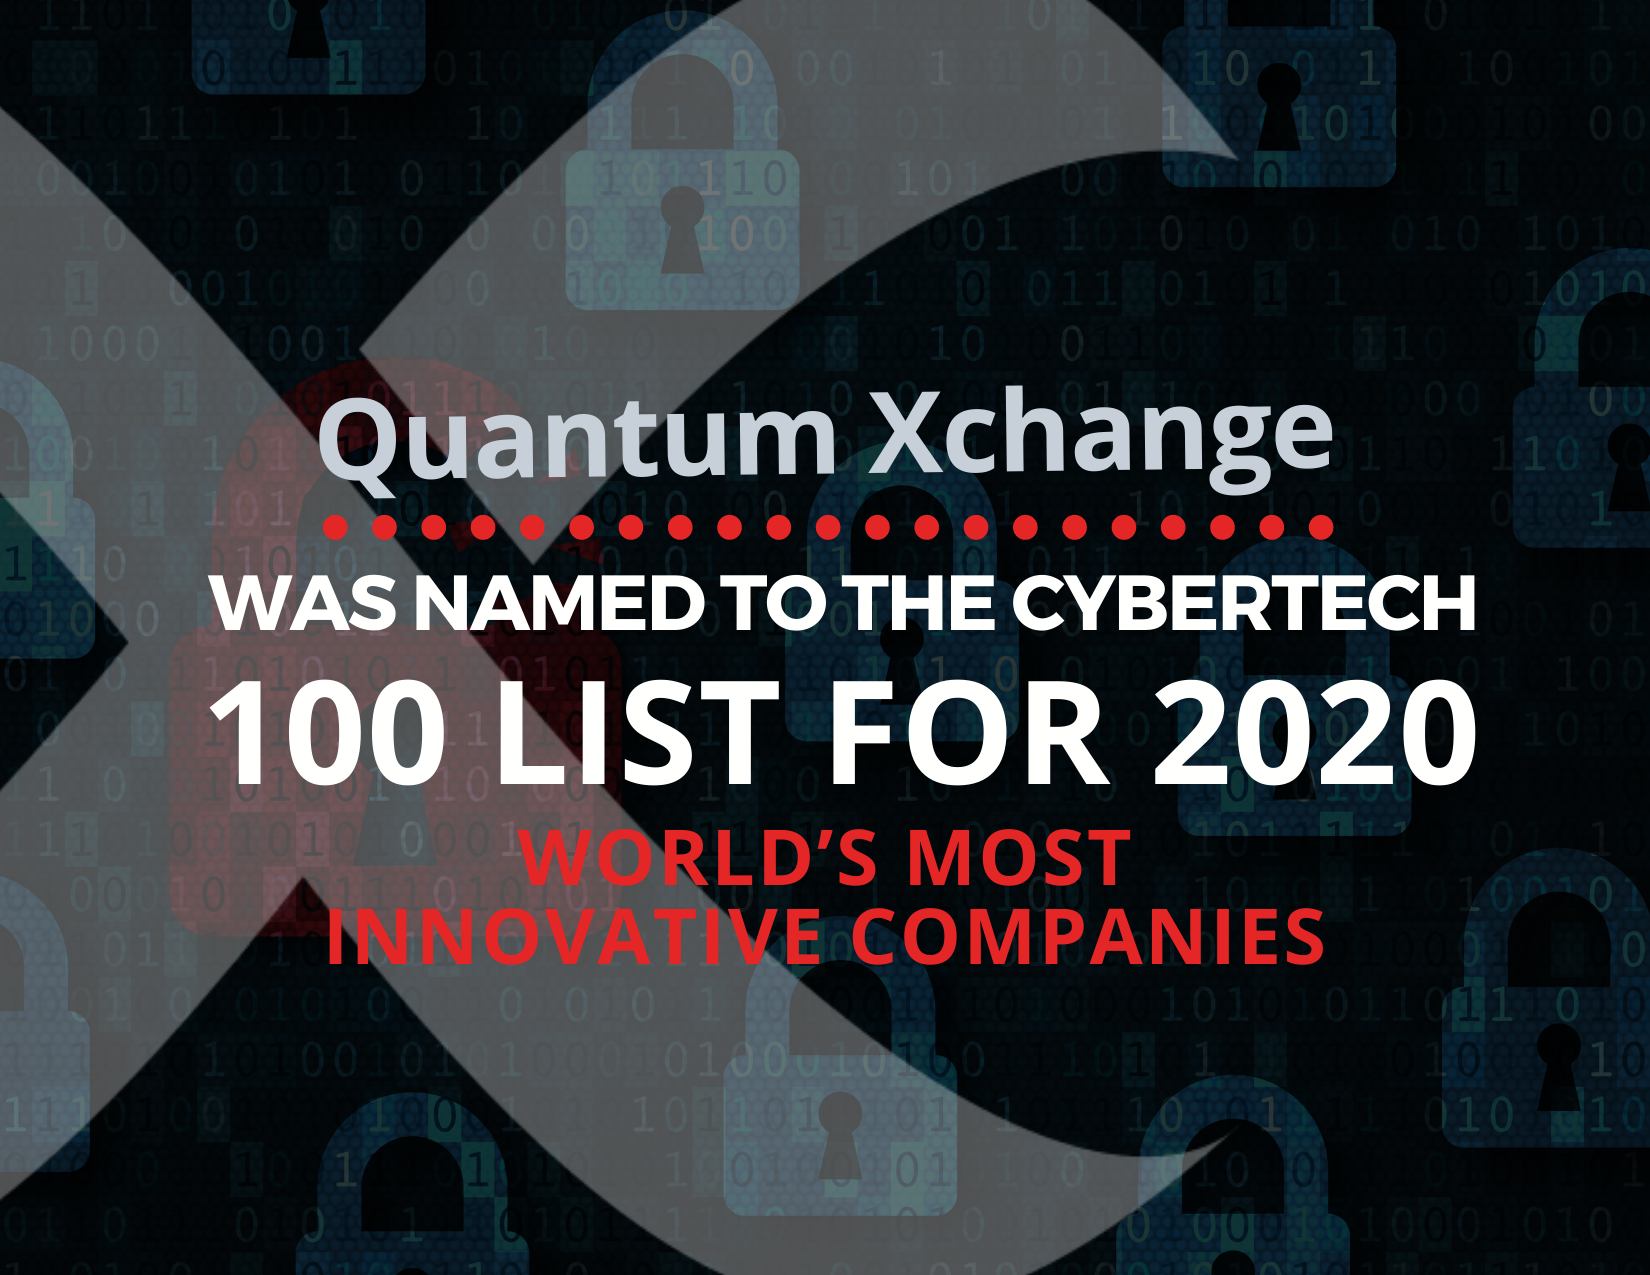 Quantum Xchange CyberTech 100 list for 2020